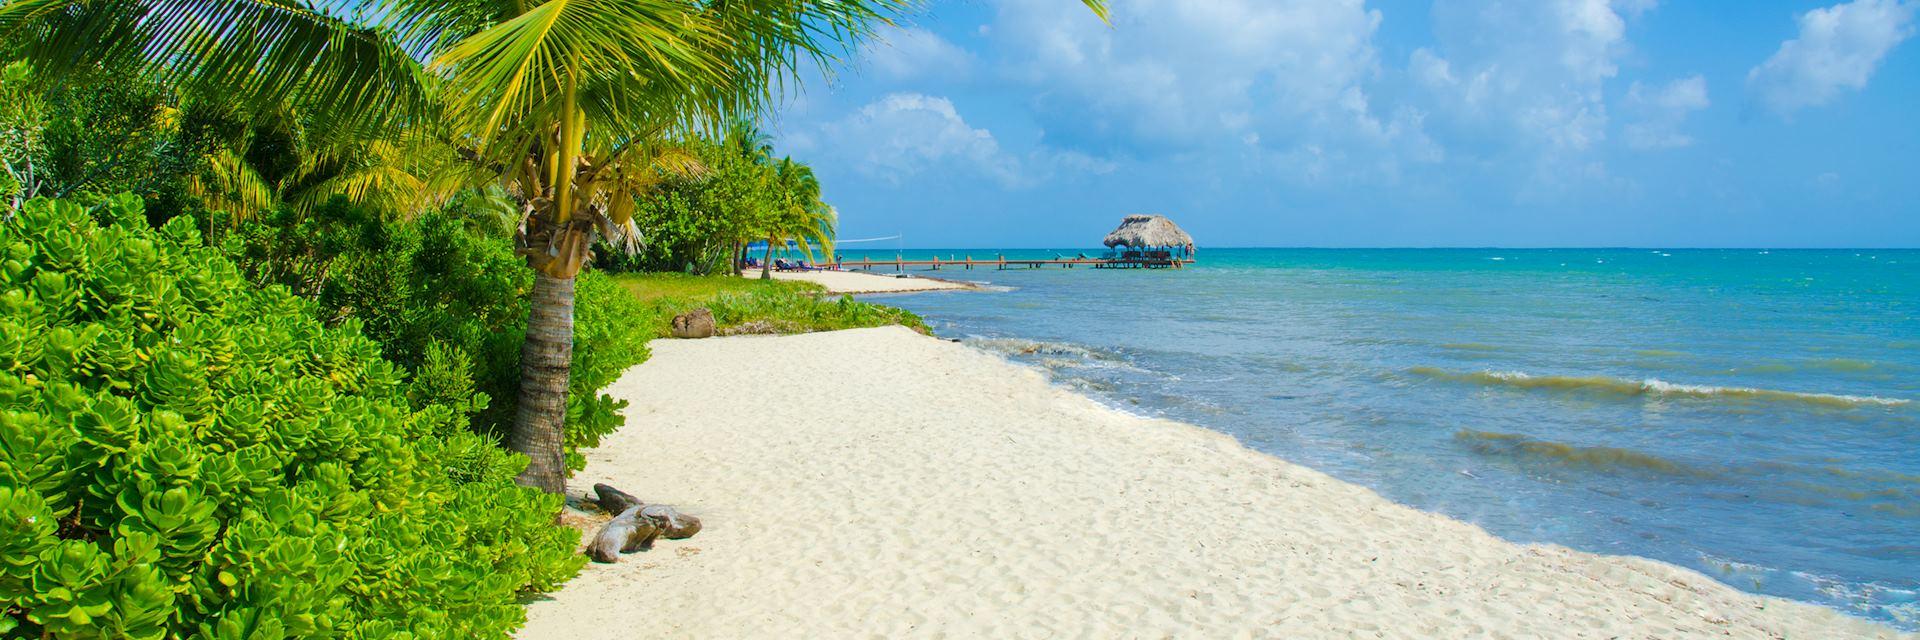 Beach in Placencia, Belize